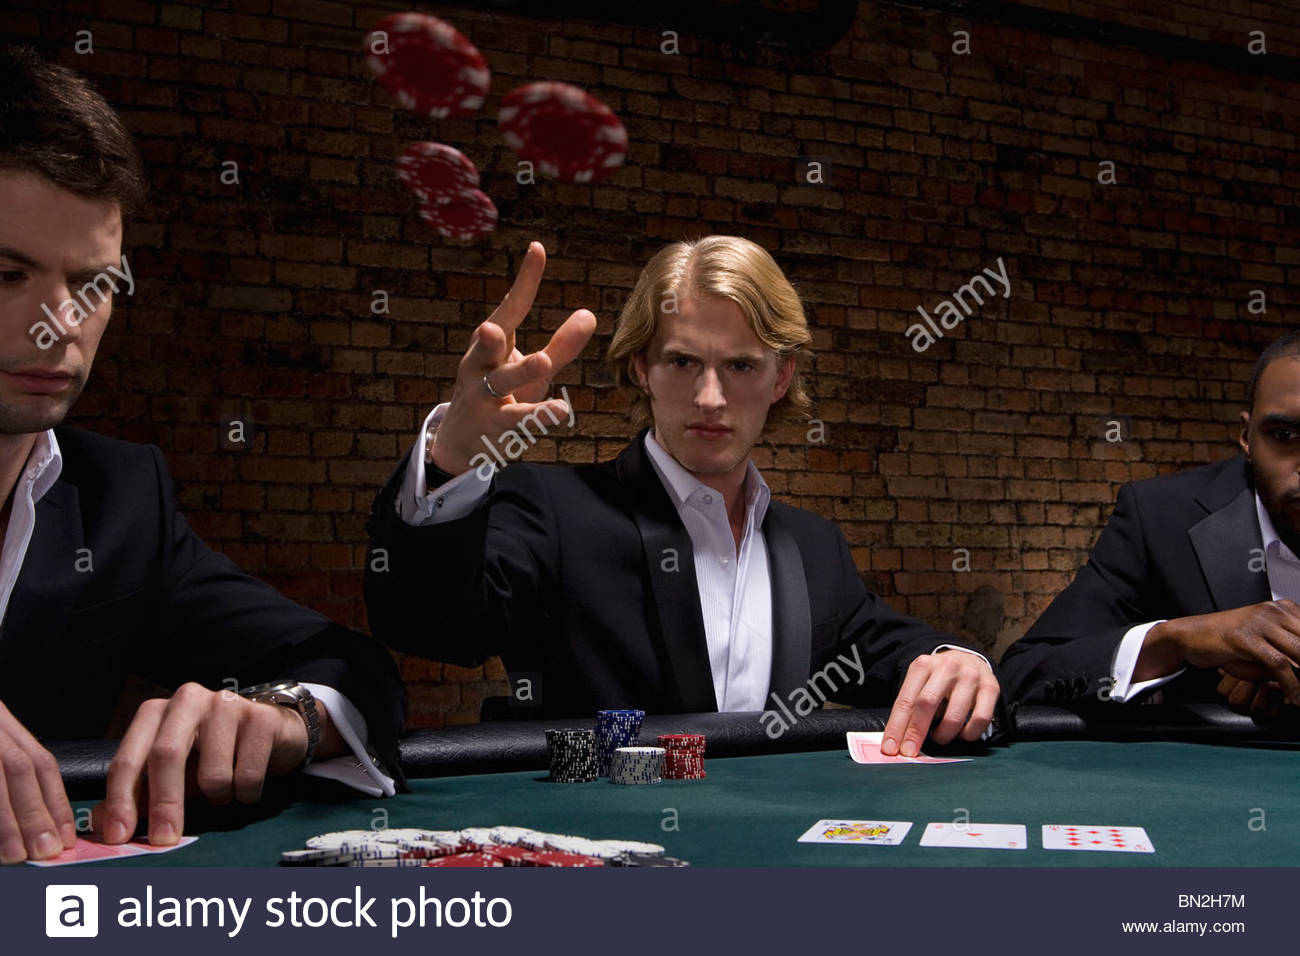 Man throwing poker chips in casino - Stock Image